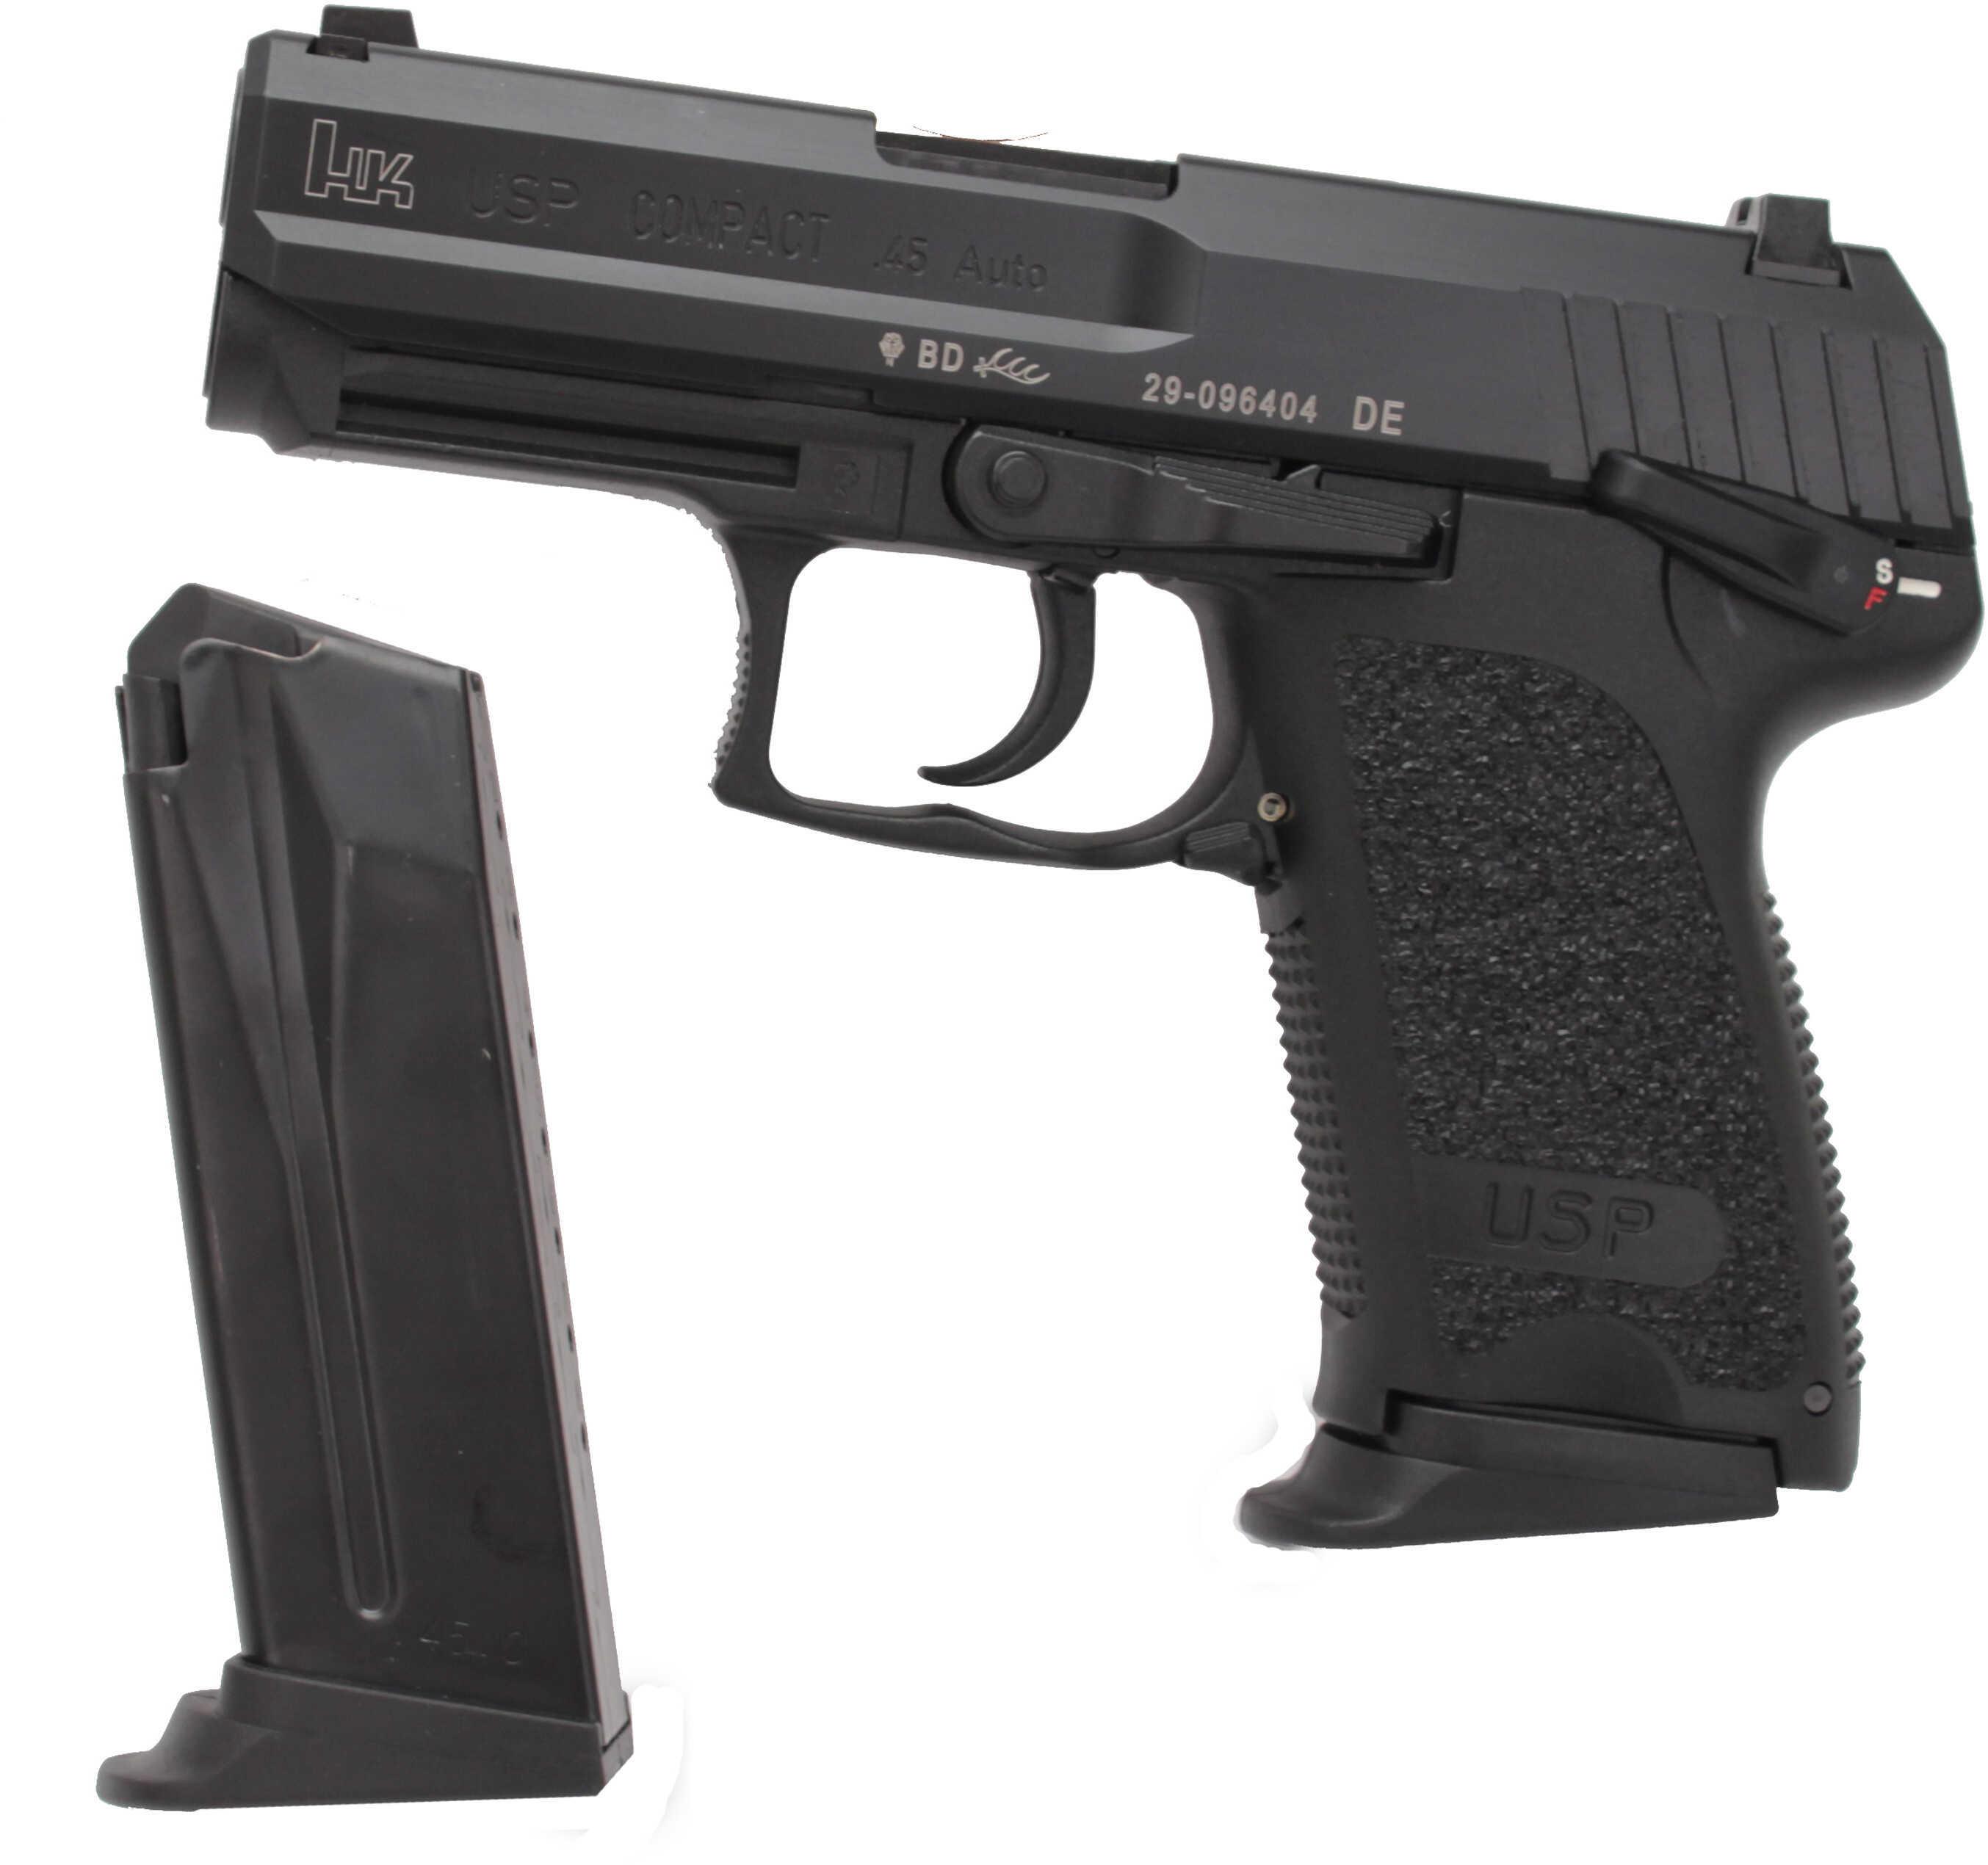 Heckler & Koch USP45C 45 ACP Compact Blued Finish 2-8 Round Semi Automatic Pistol 704531